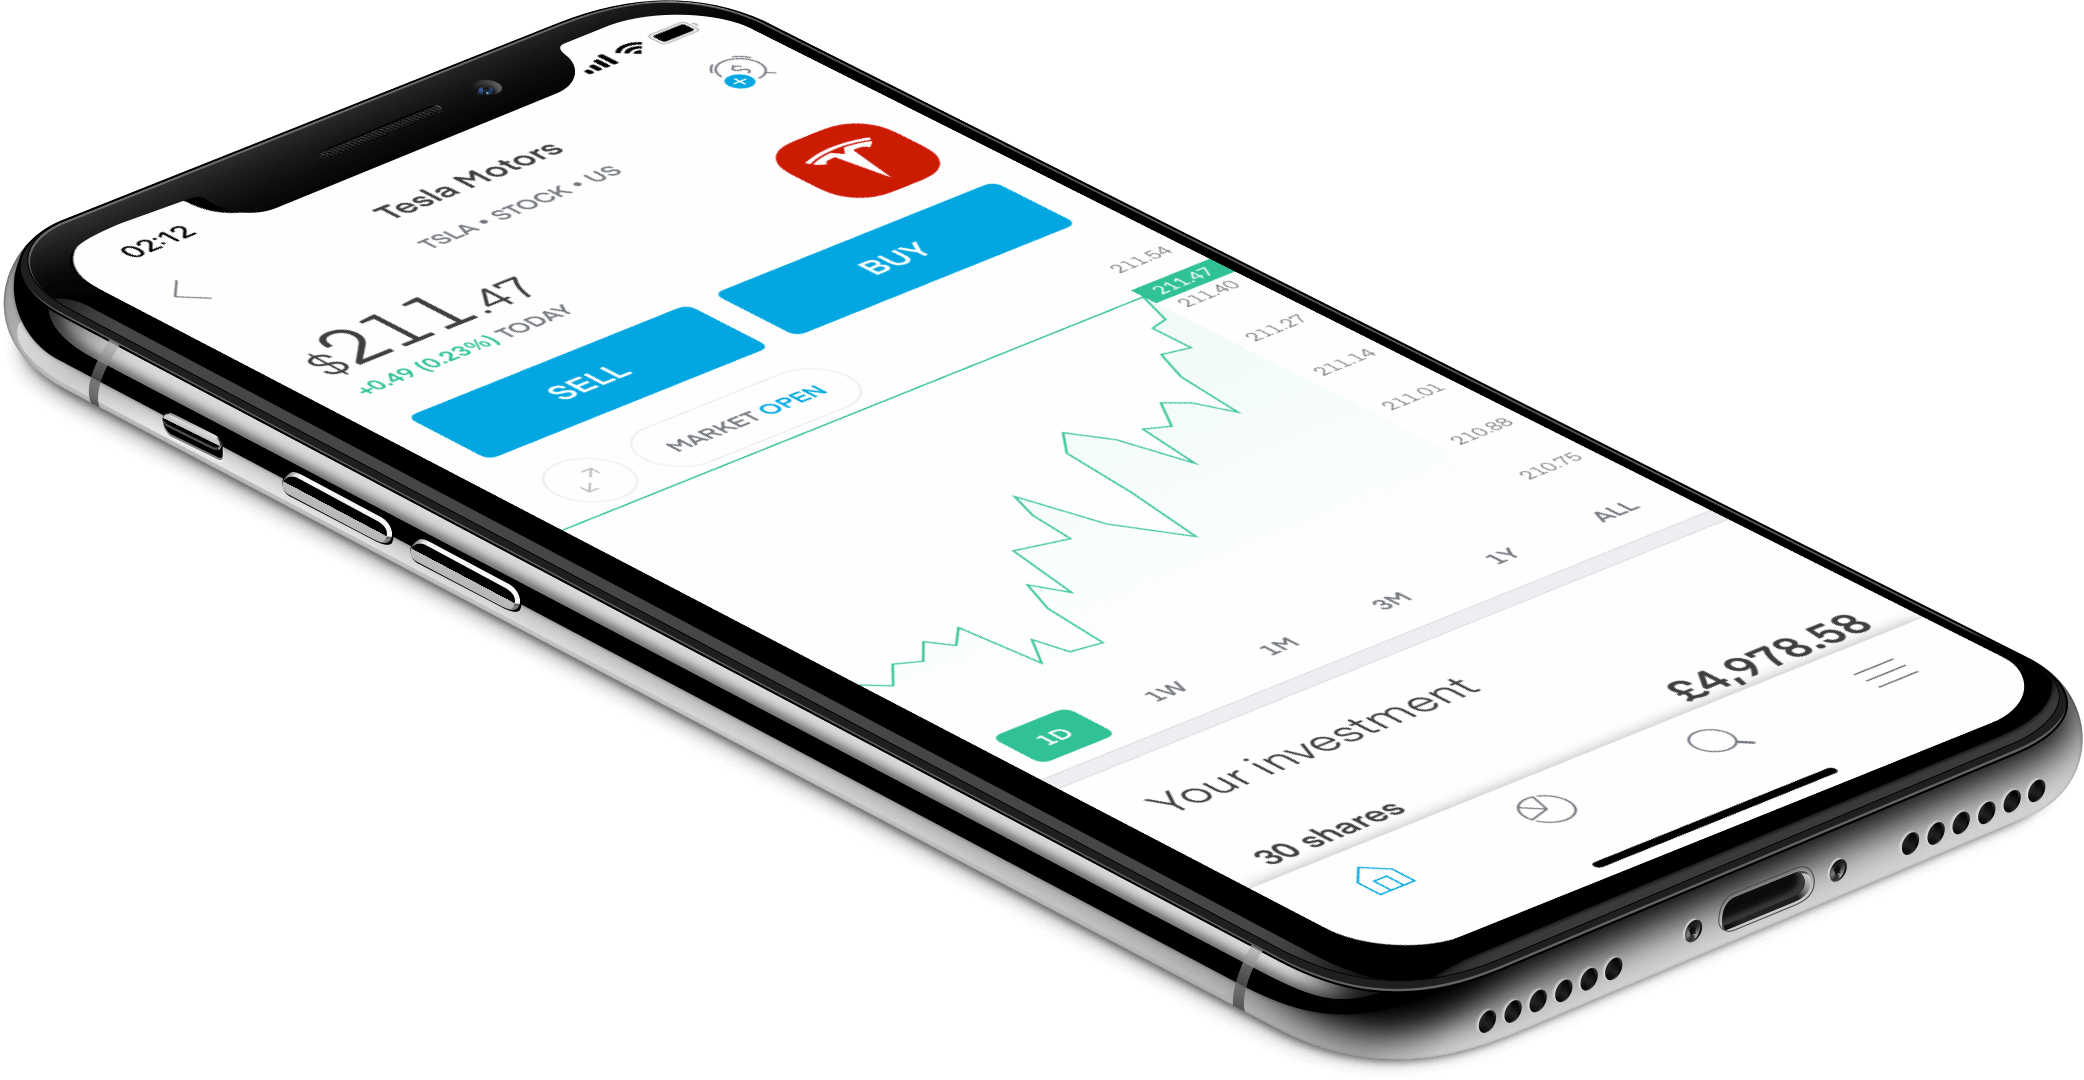 Trading 212 - Handel am Smartphone